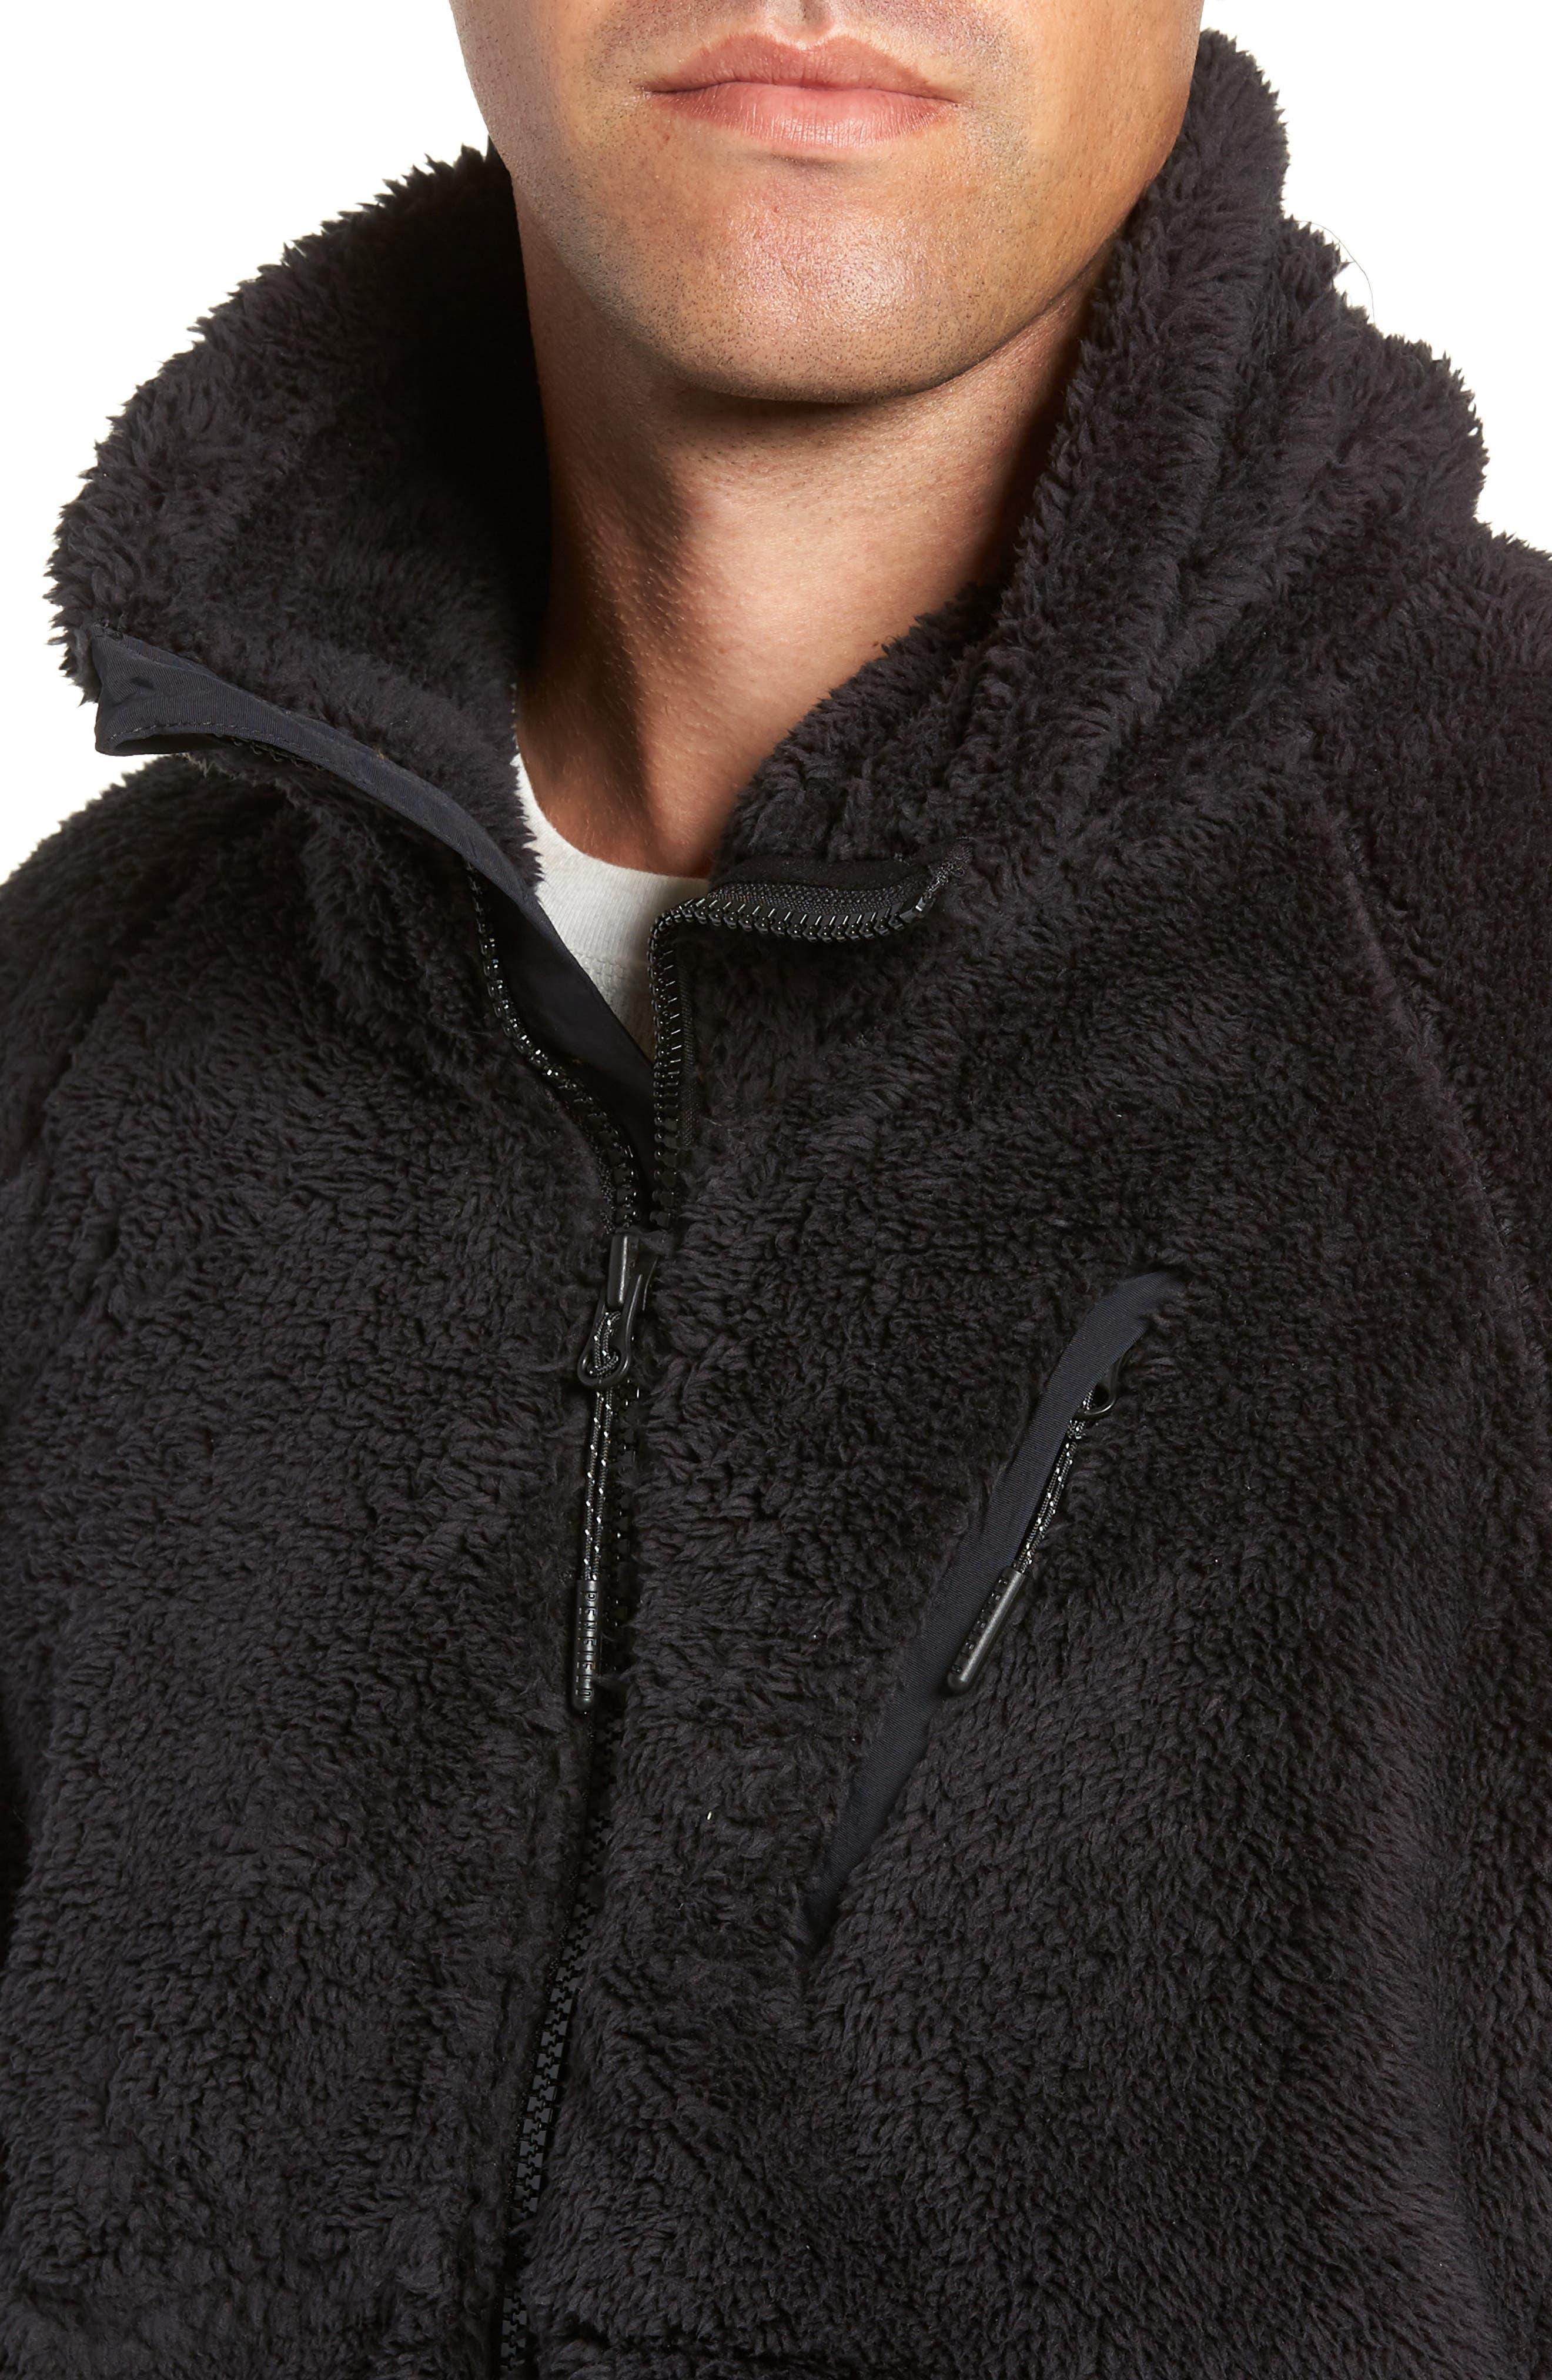 Breakheart Zip Fleece Jacket,                             Alternate thumbnail 4, color,                             001